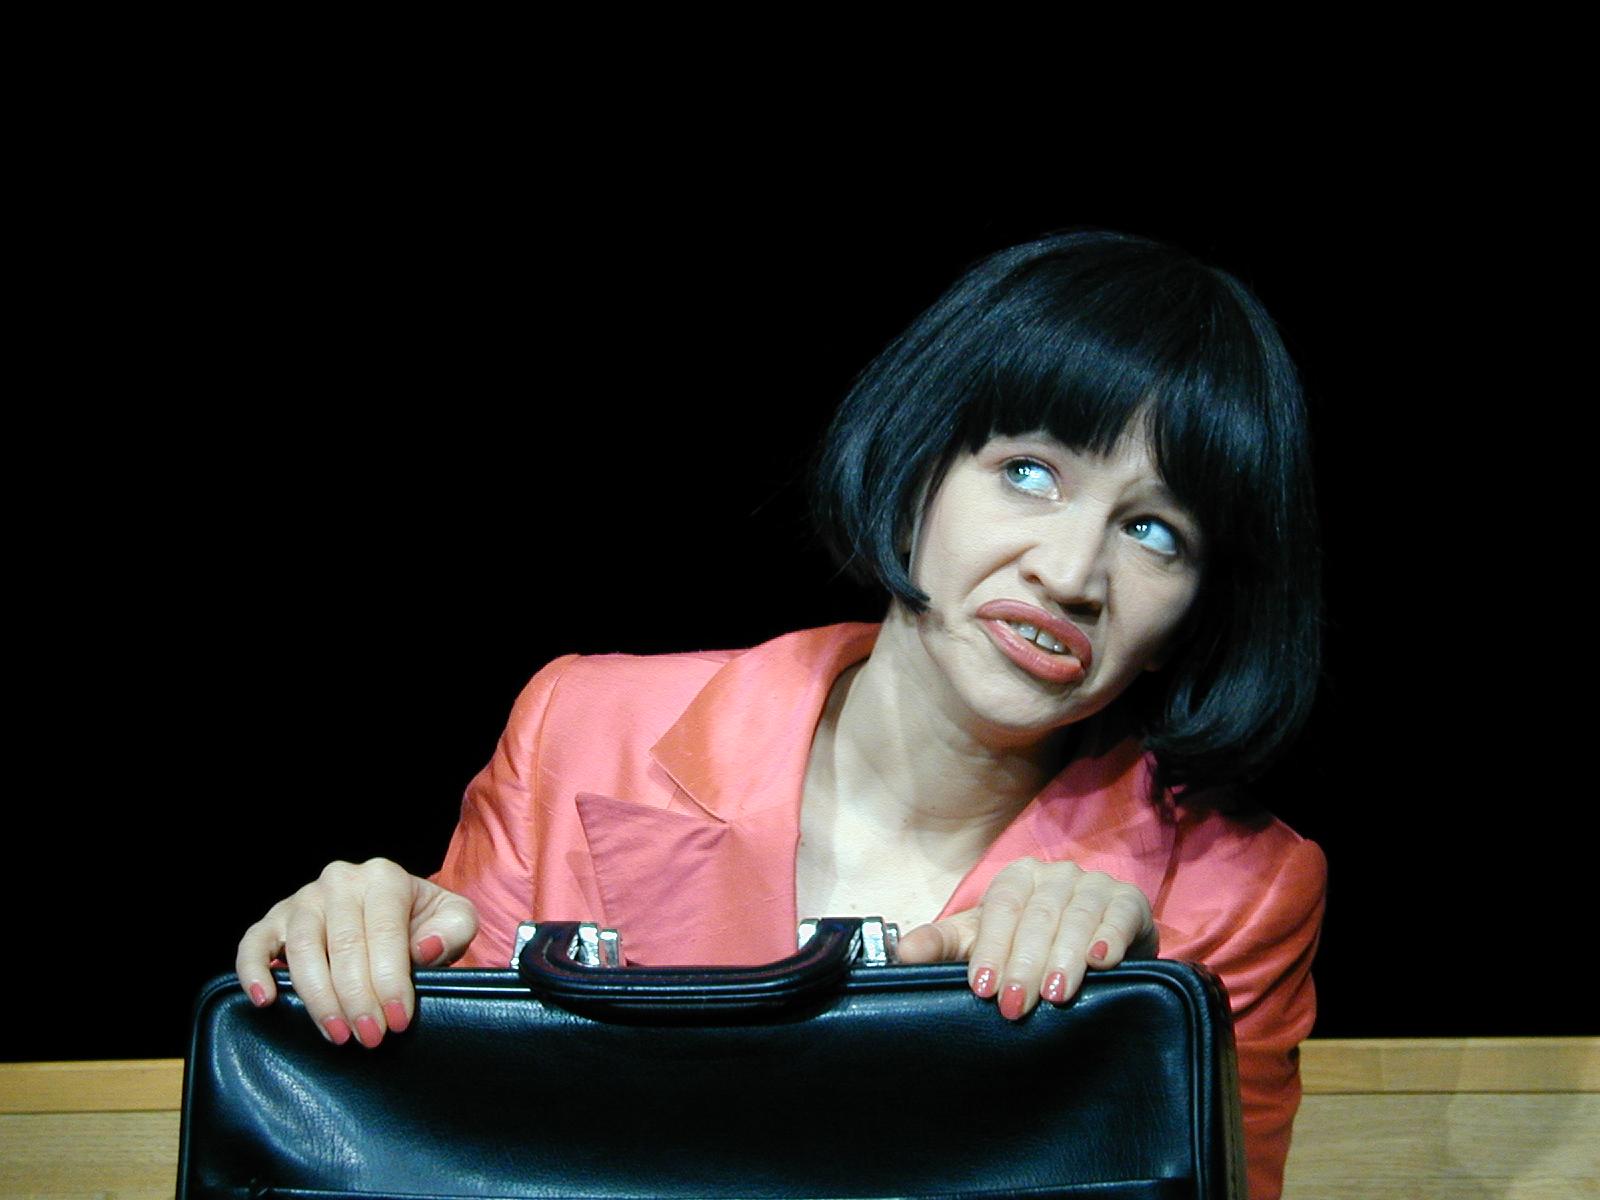 Bettina Kaminski in GLAUBE LIEBE HOFFNUNG © Mischa Goldmann